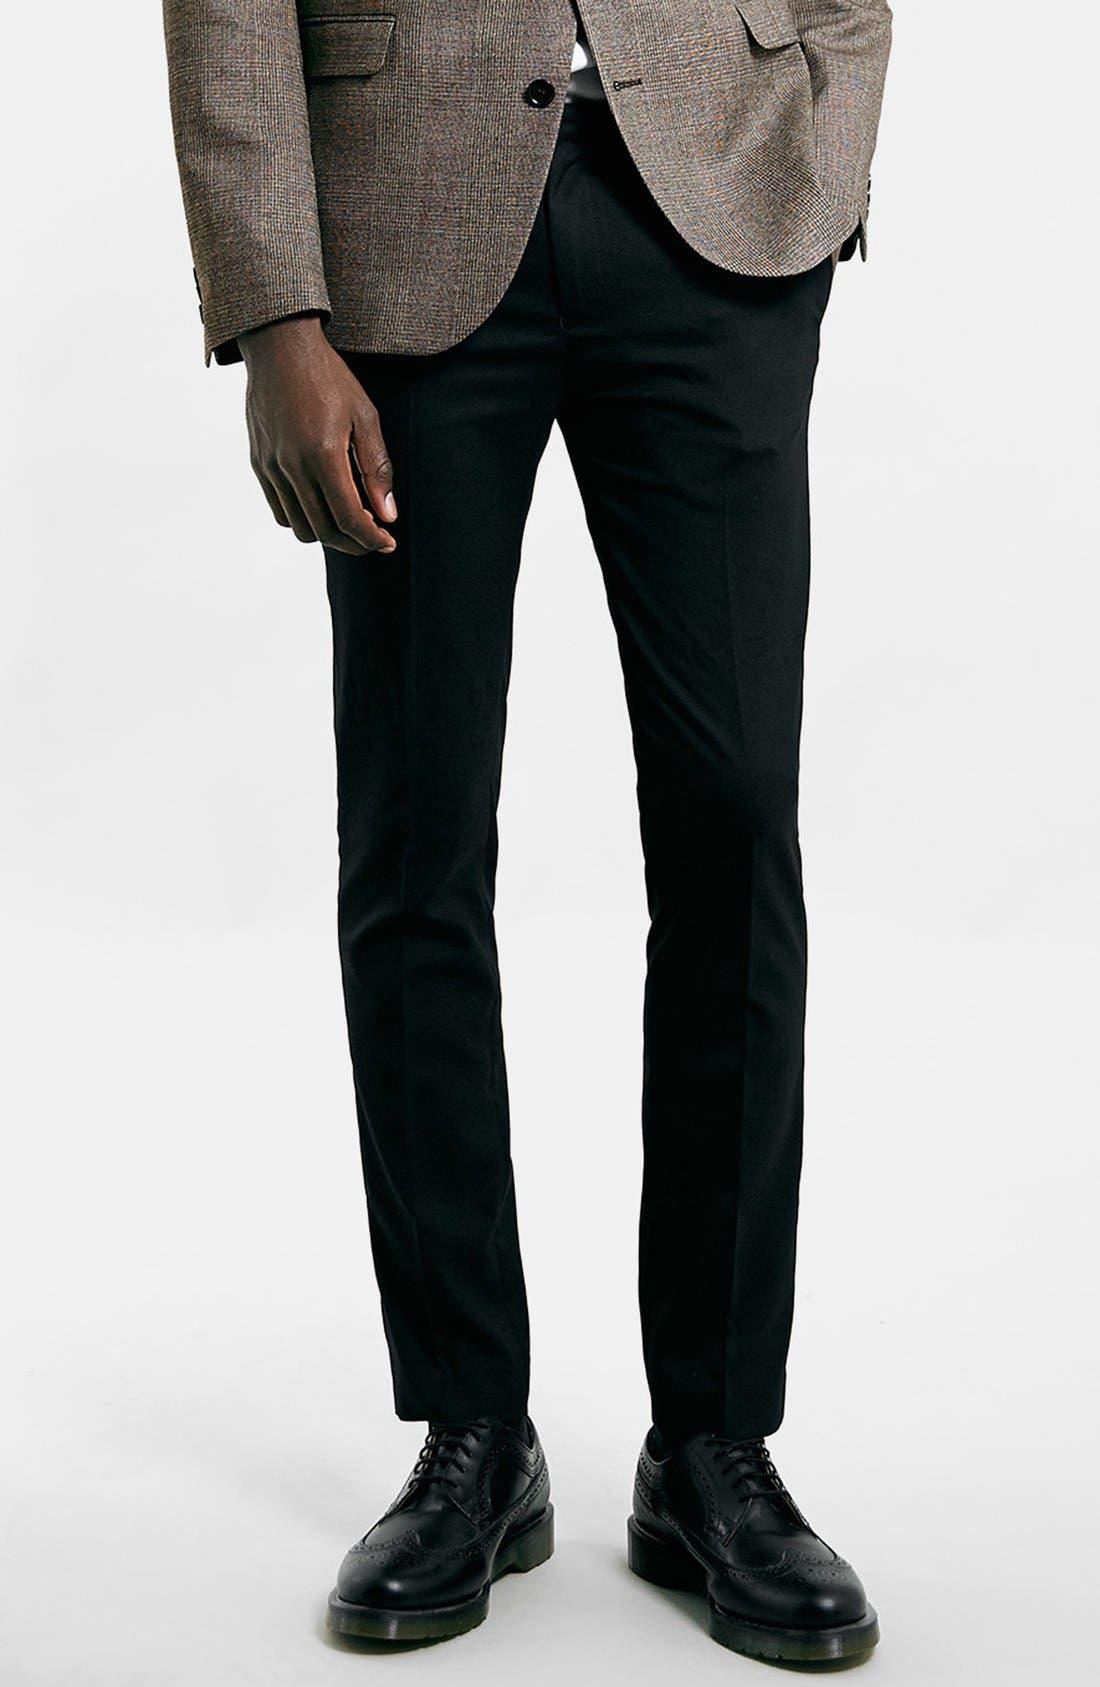 Main Image - Topman Ultra Skinny Black Suit Trousers